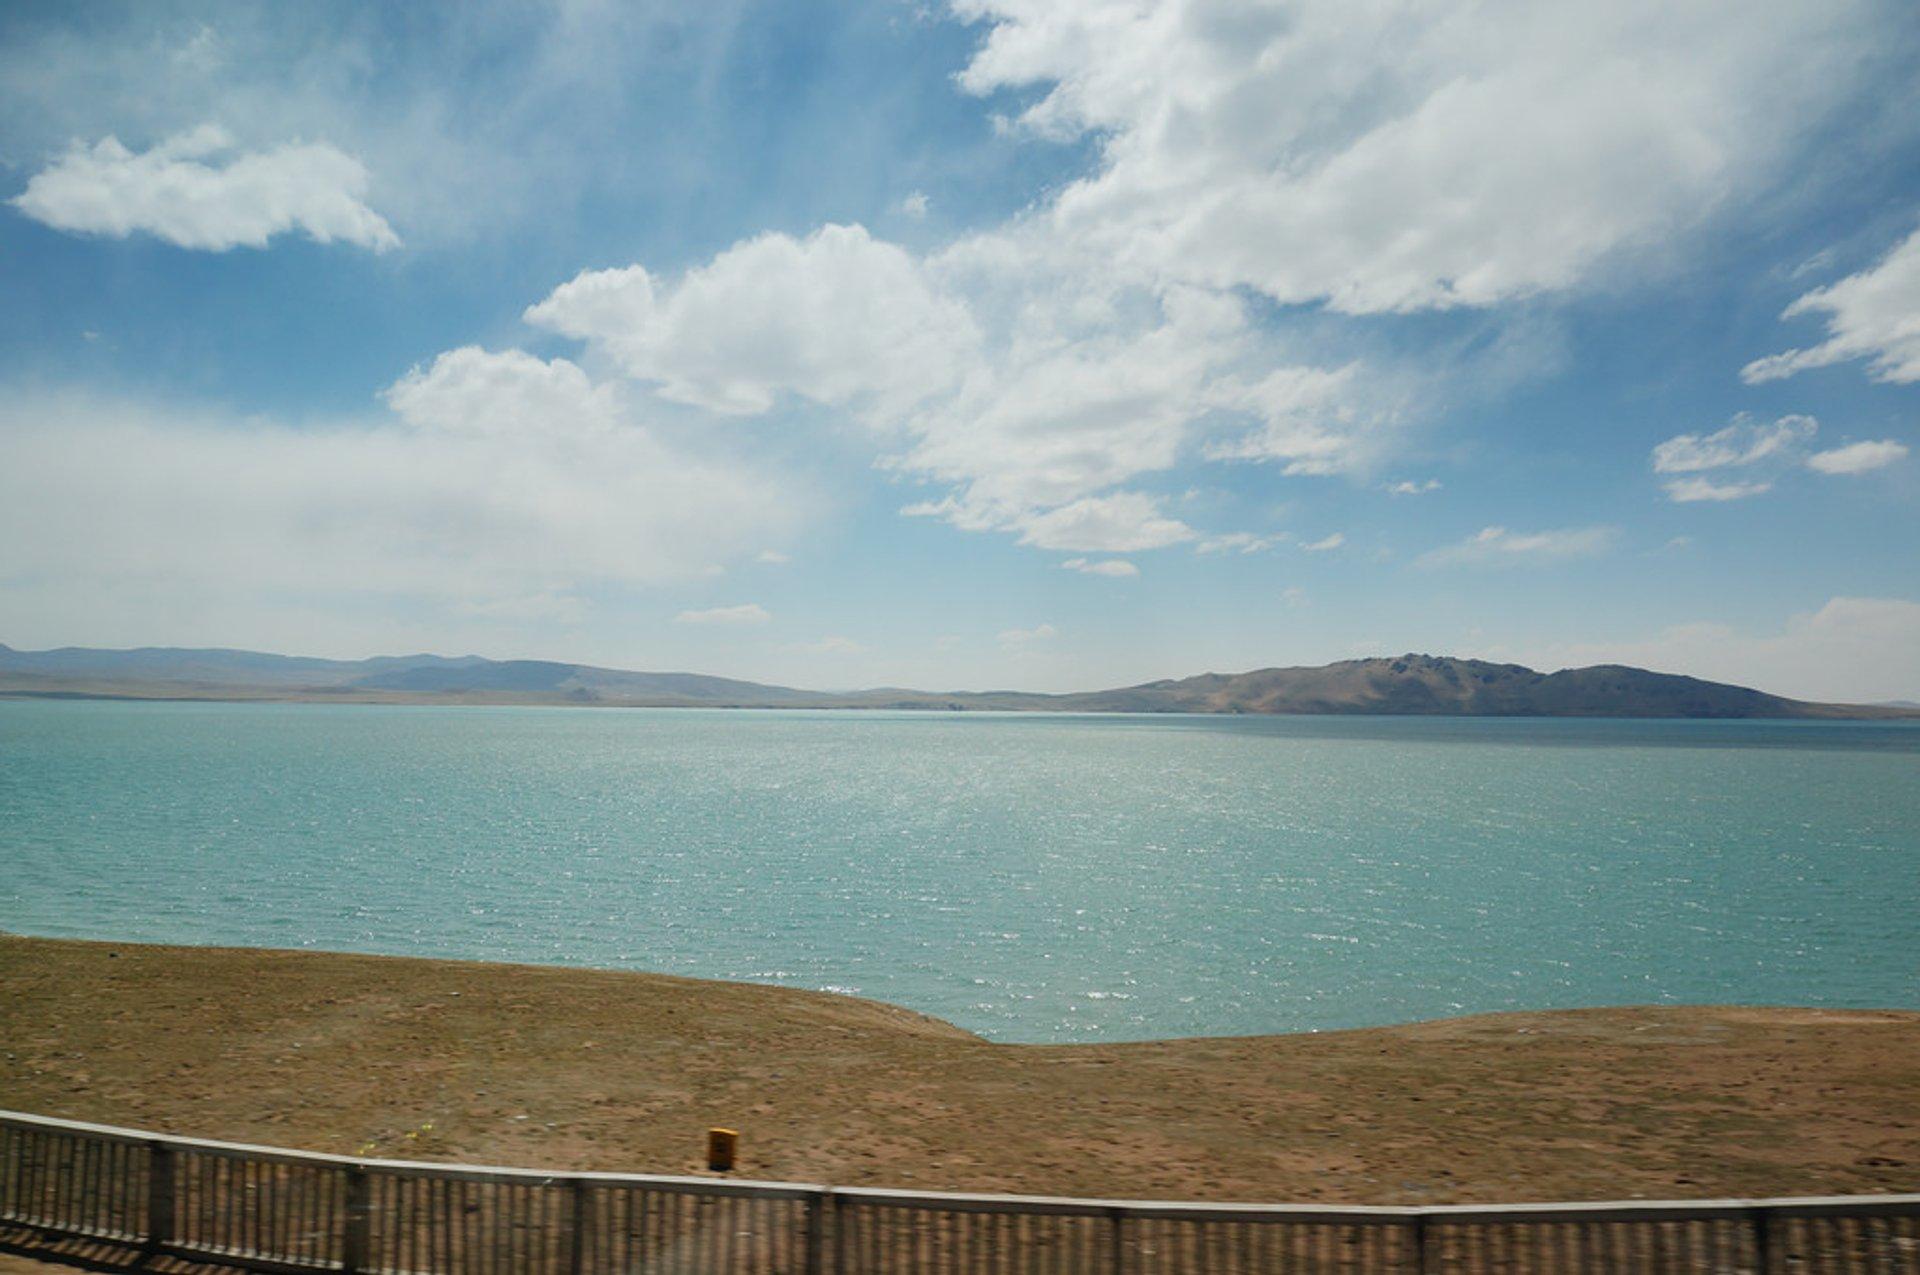 Qinghai-Tibet Railway View 2020